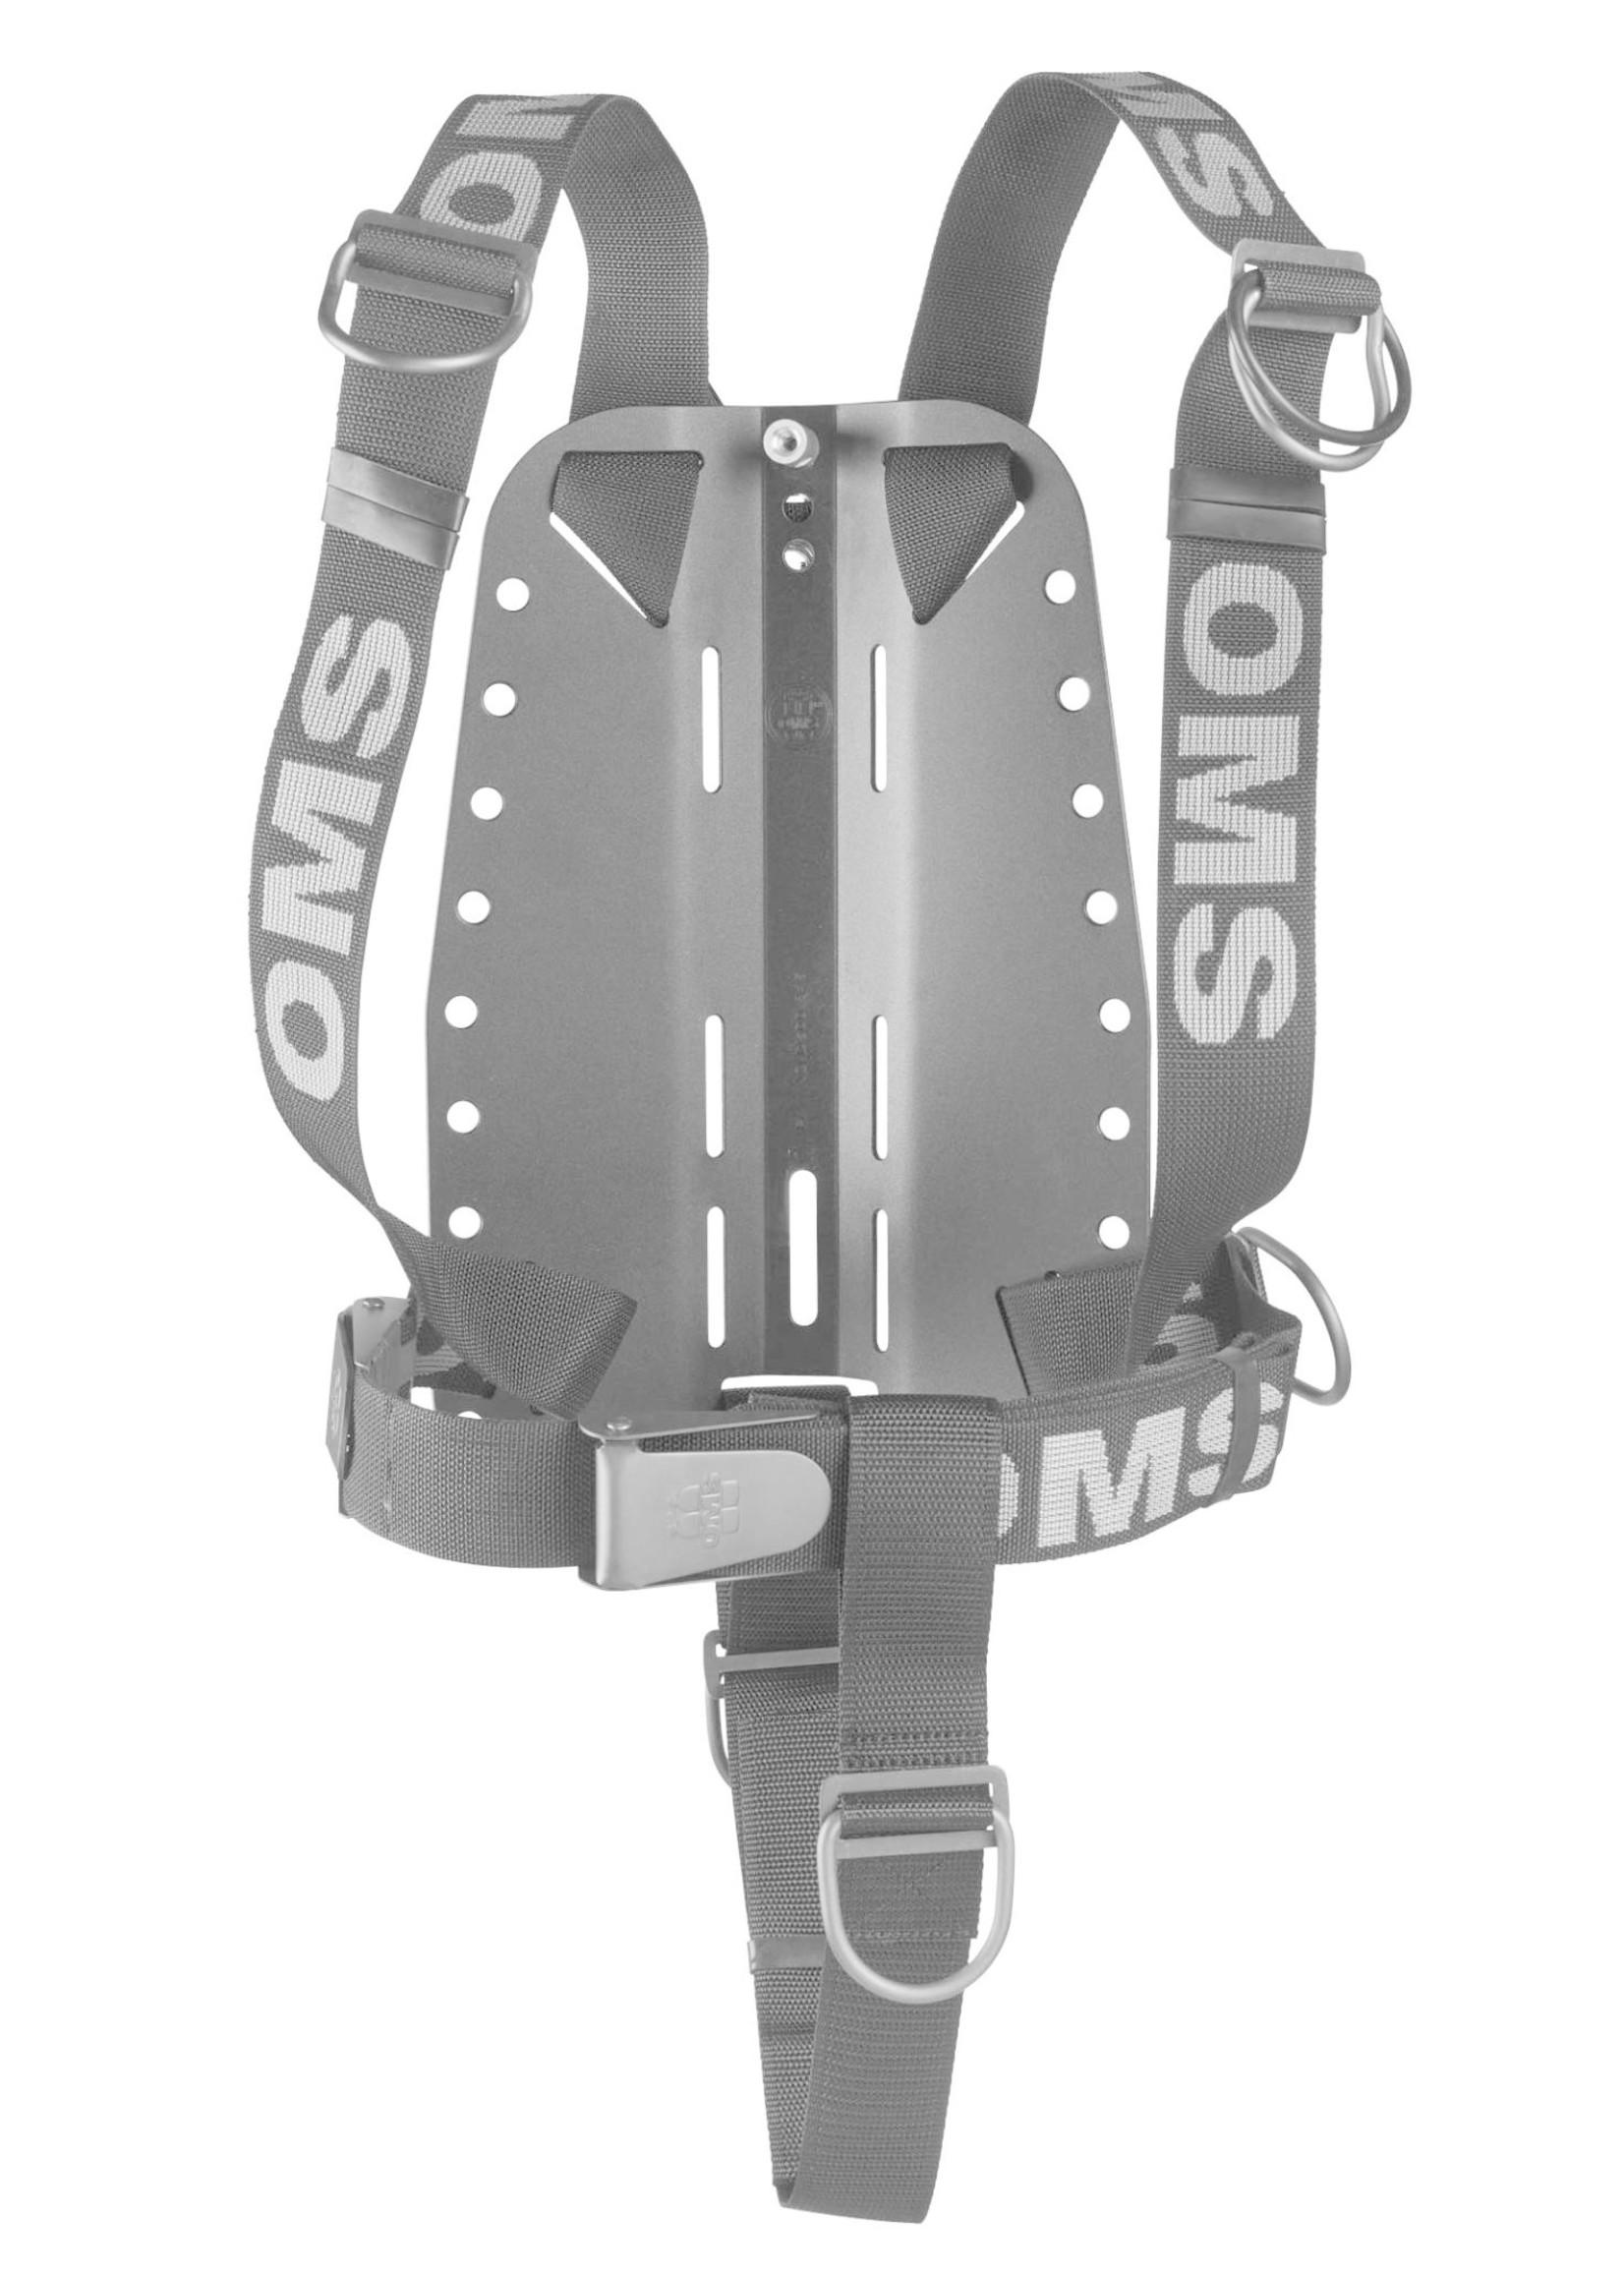 OMS OMS AL backplate met SmartStream Harness en Crotch Strap